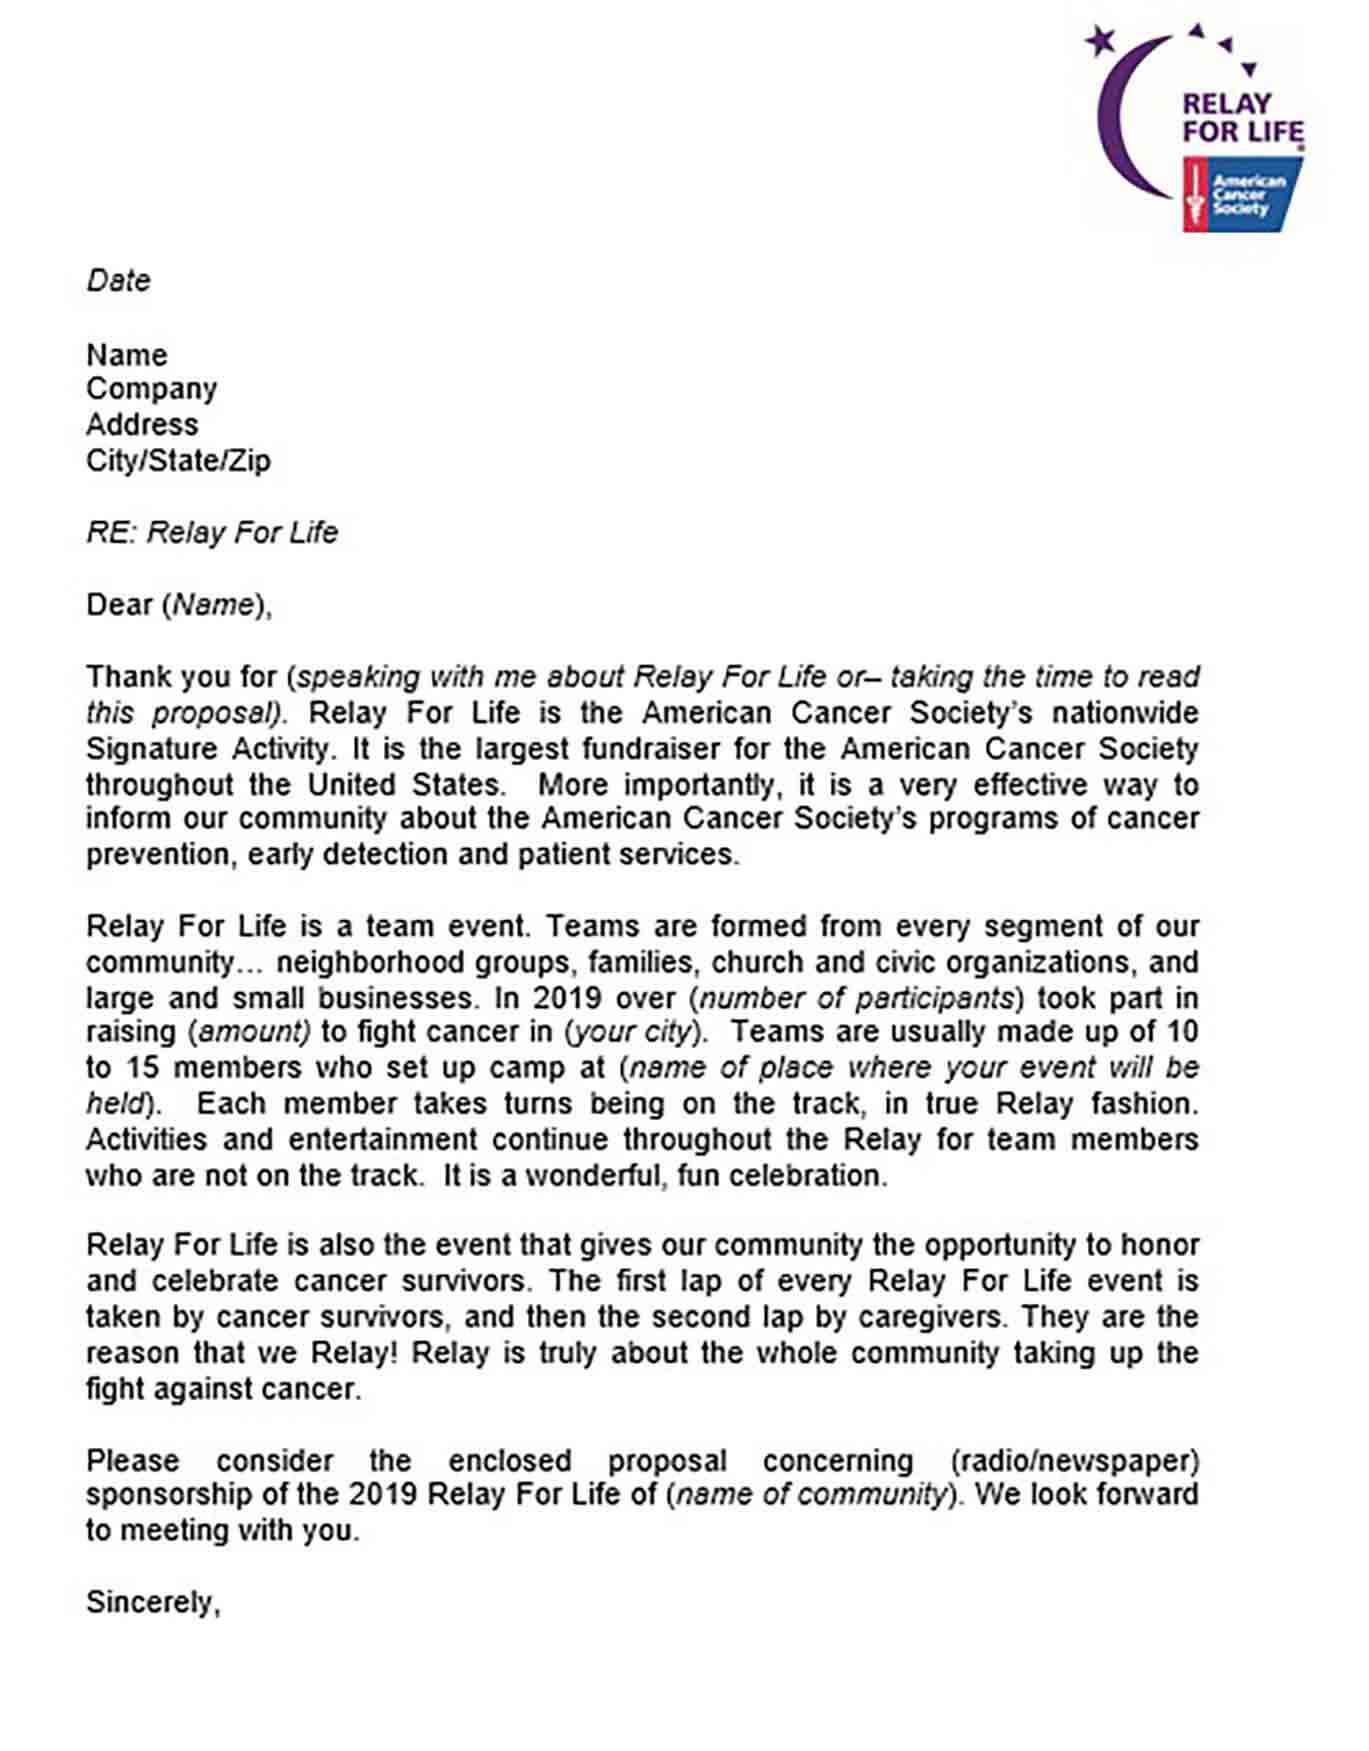 Media Partnership Proposal Letter DOC